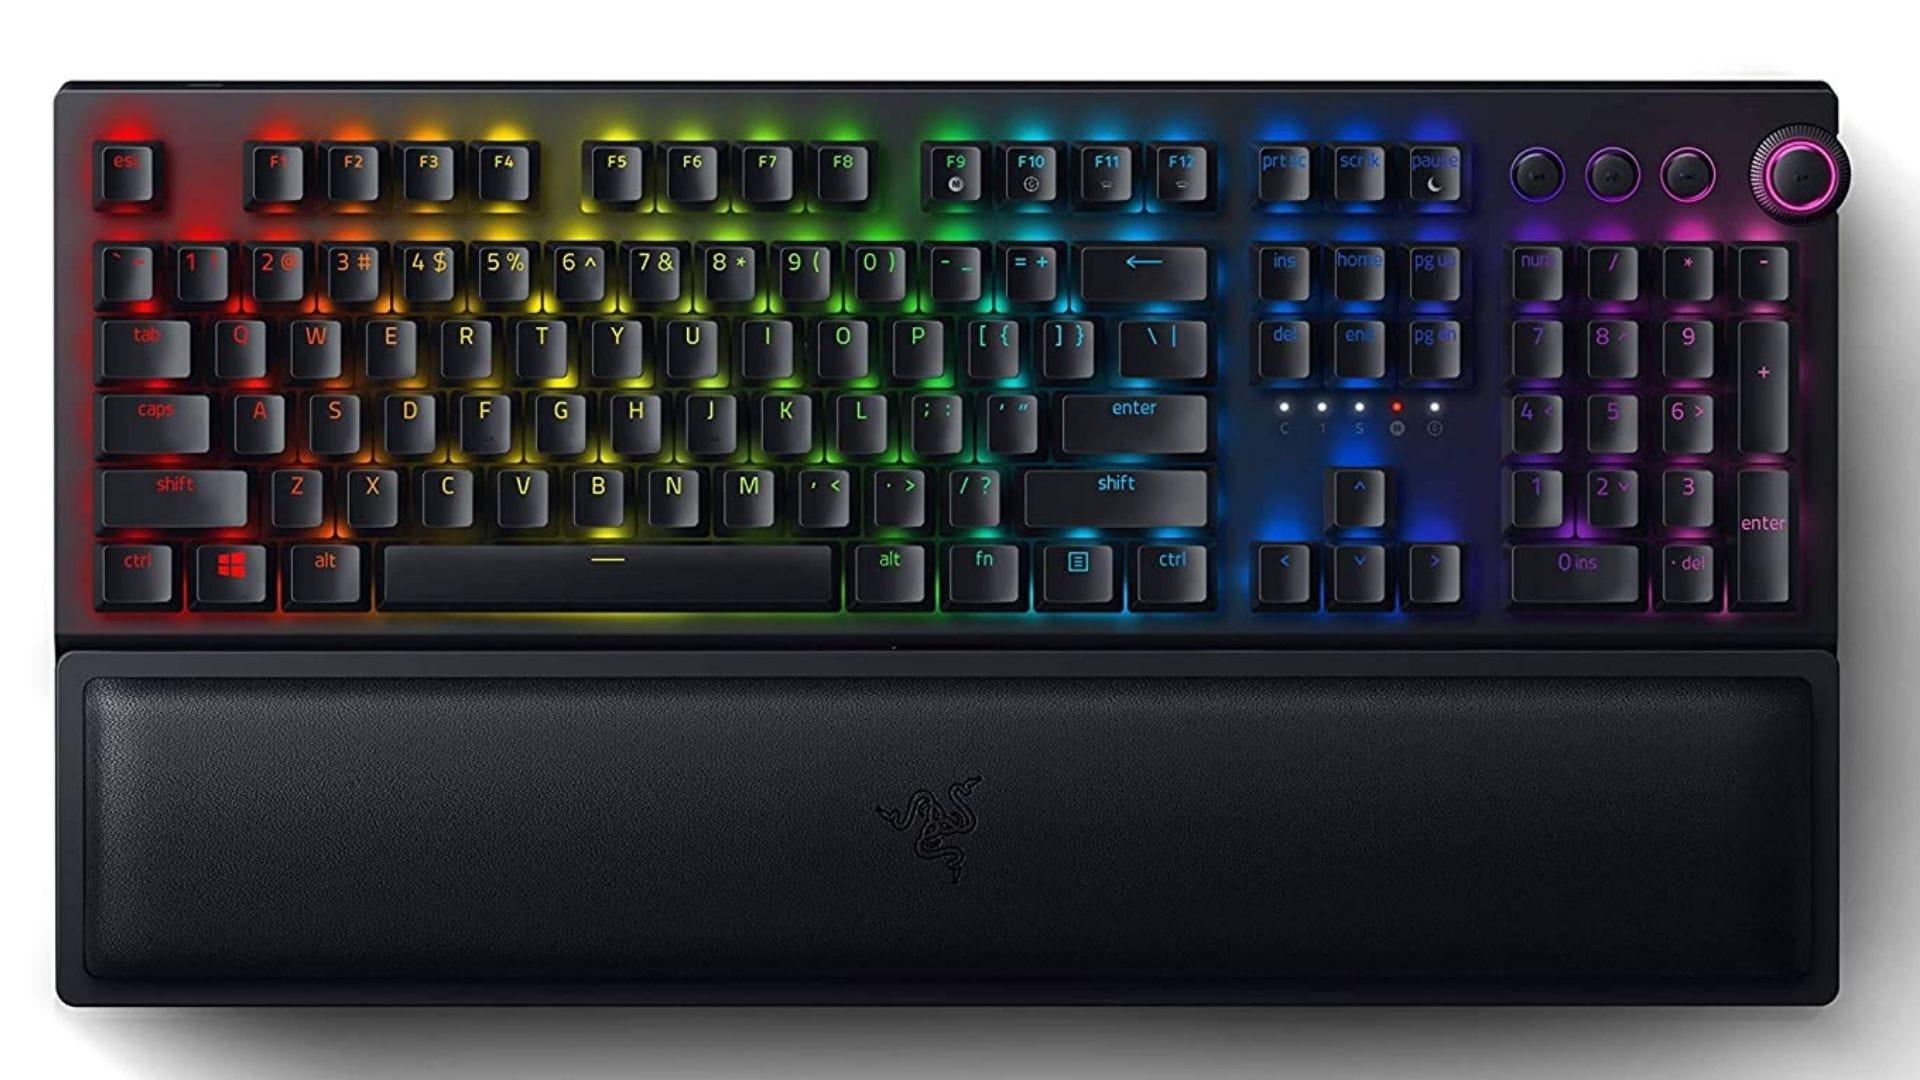 Razer BlackWidow V3 Pro Mechanical Wireless Gaming Keyboard